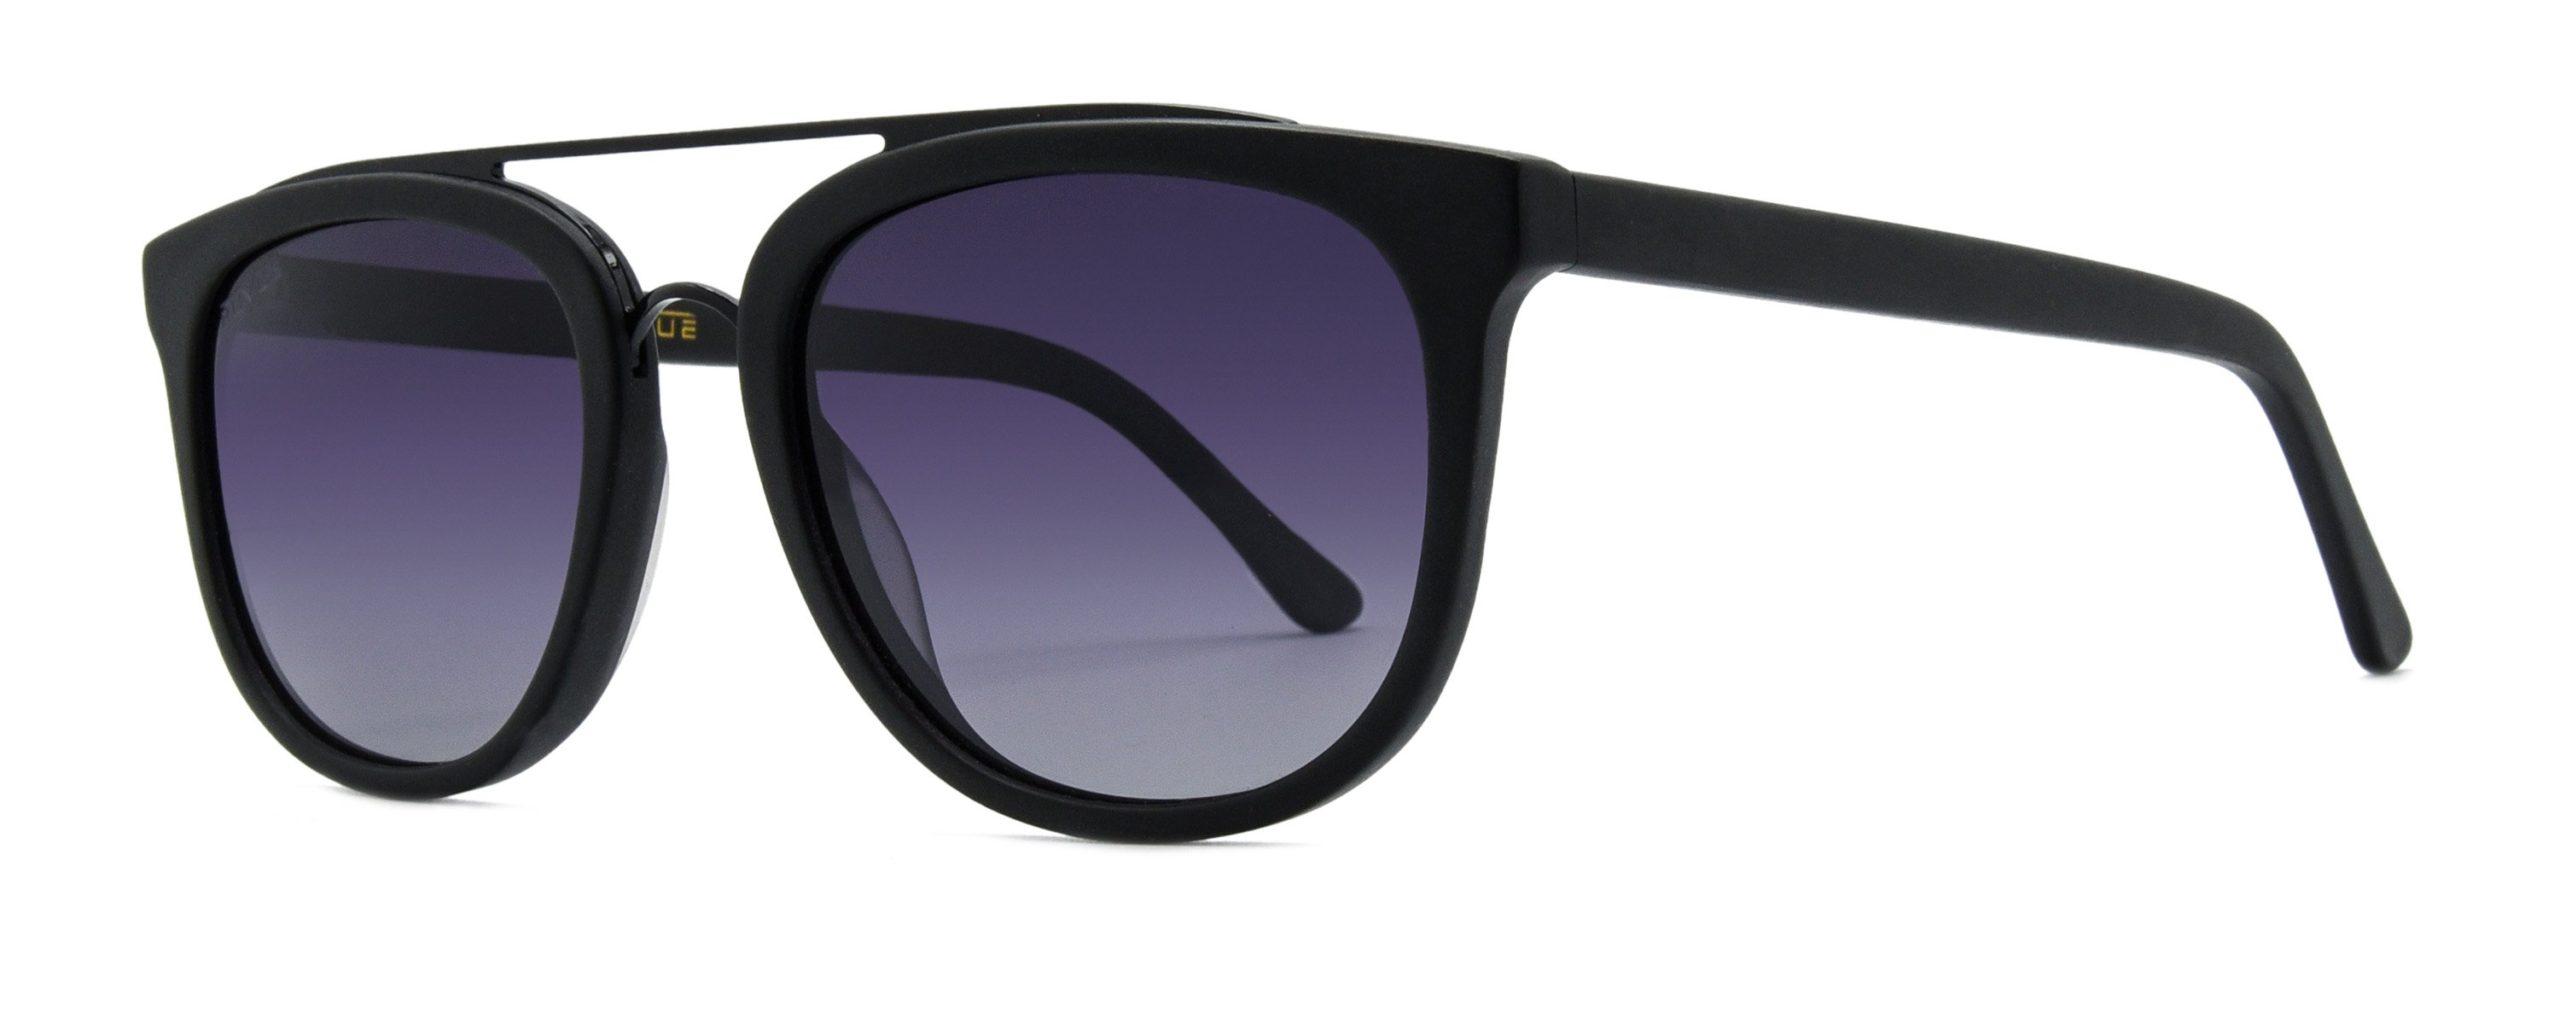 Zena - Matte Black - Black Gradient Polarized Grey Lenses - Angle